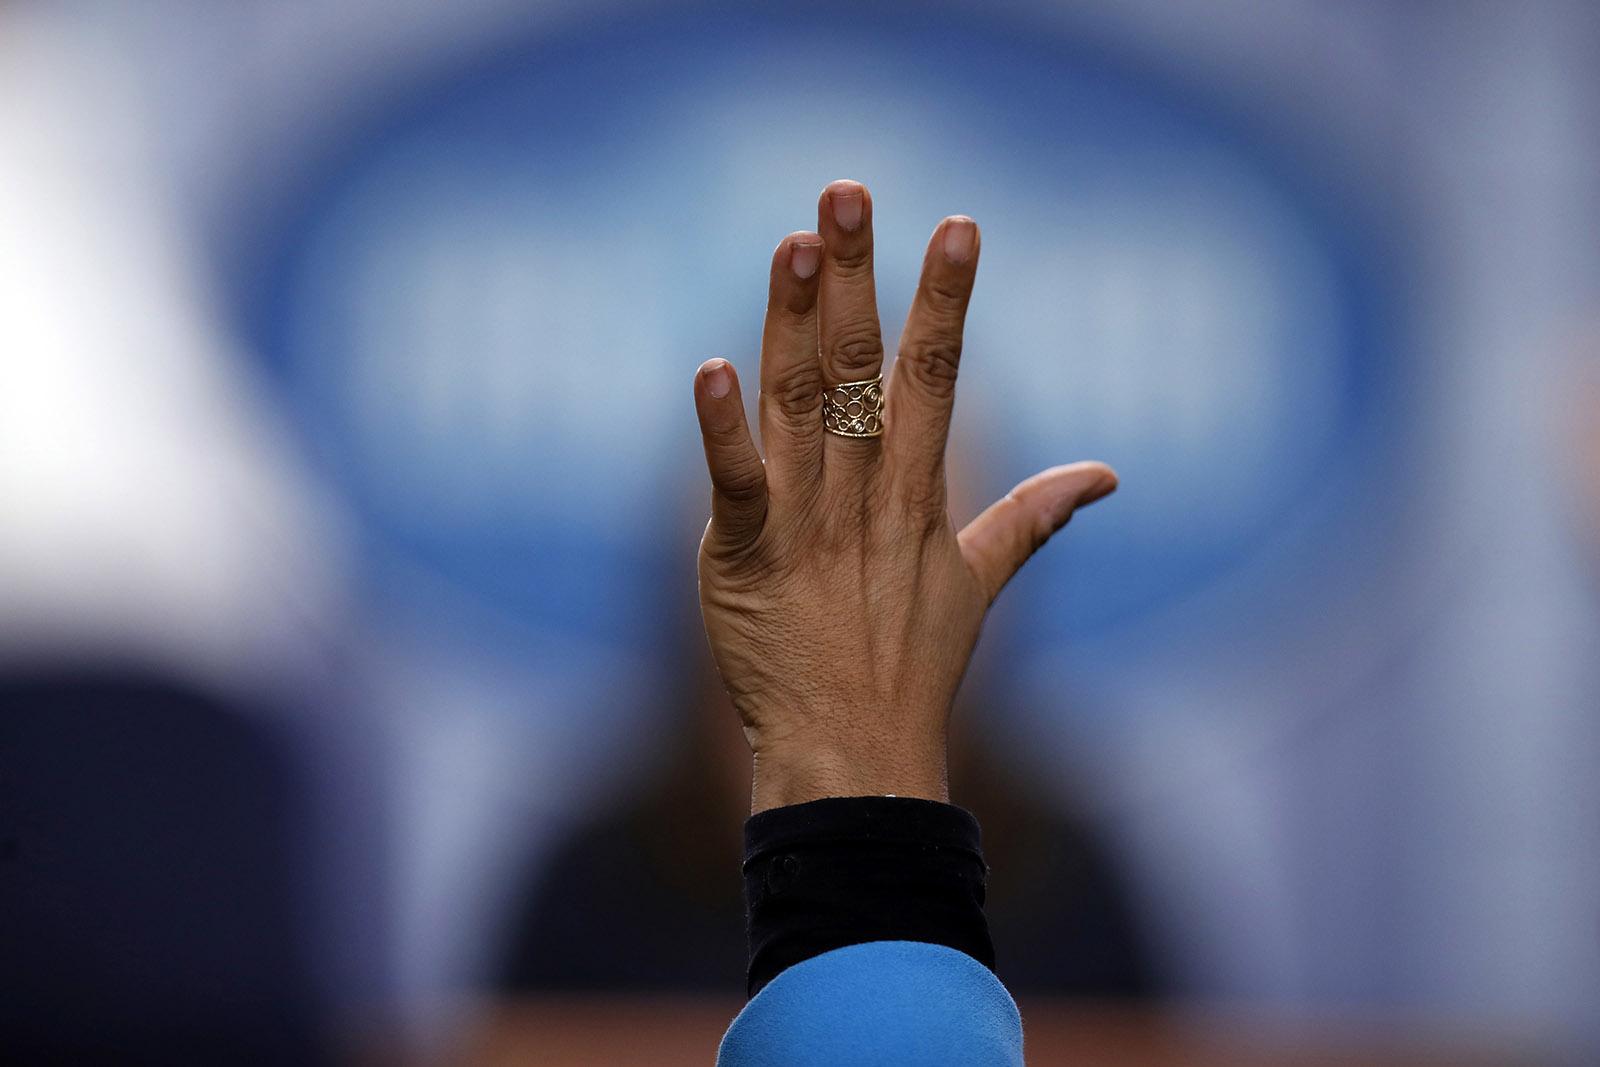 April Ryan raising her hand to put a question to White House press secretary Sarah Huckabee Sanders, Washington, D.C., October 31, 2017